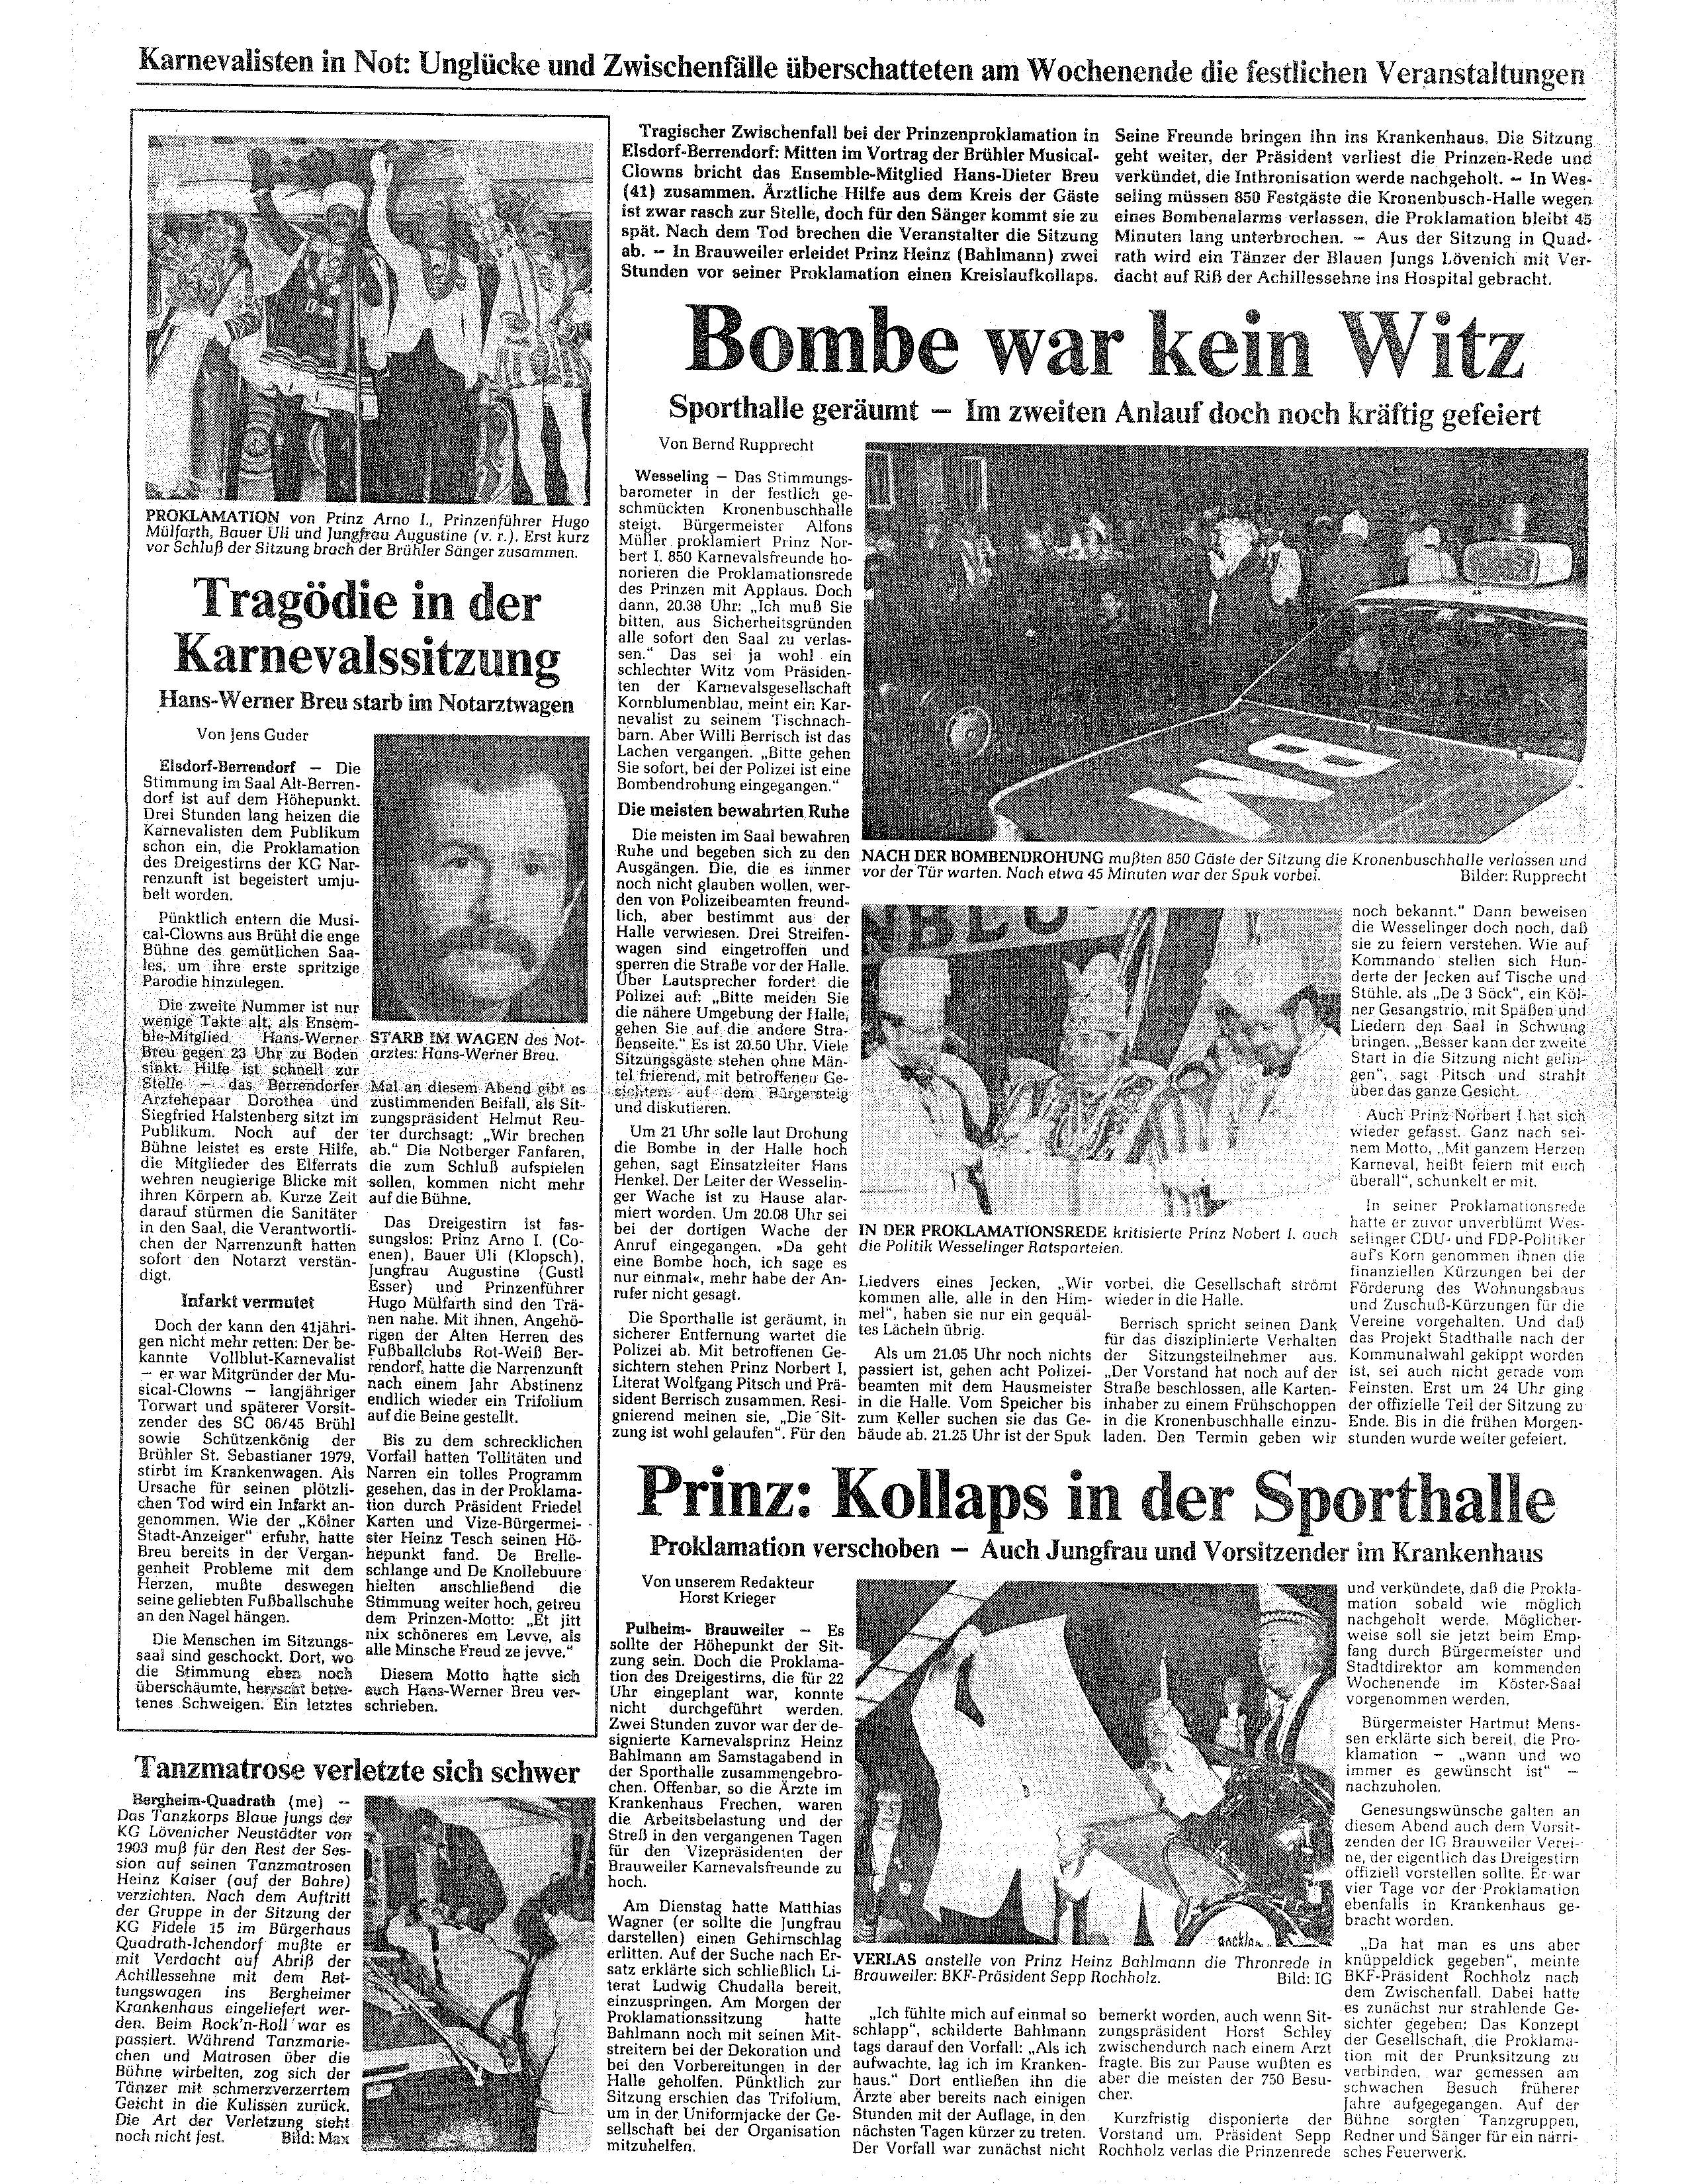 Kölner Stadtanzeiger, 15. Januar 1990